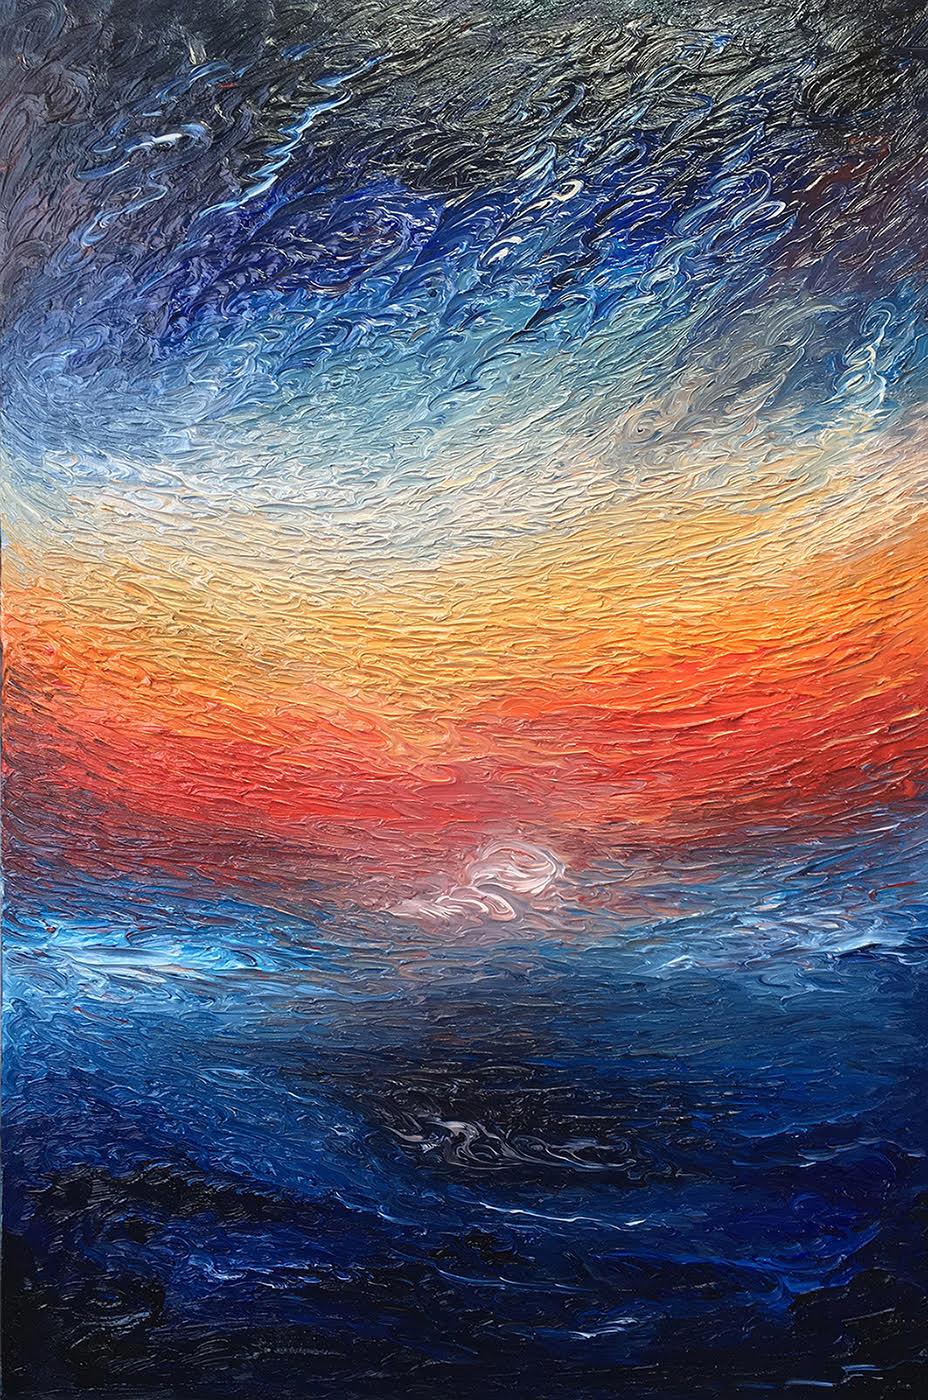 Neon Noon, 2018 | Oil on canvas | 60 x 90 cm | £950